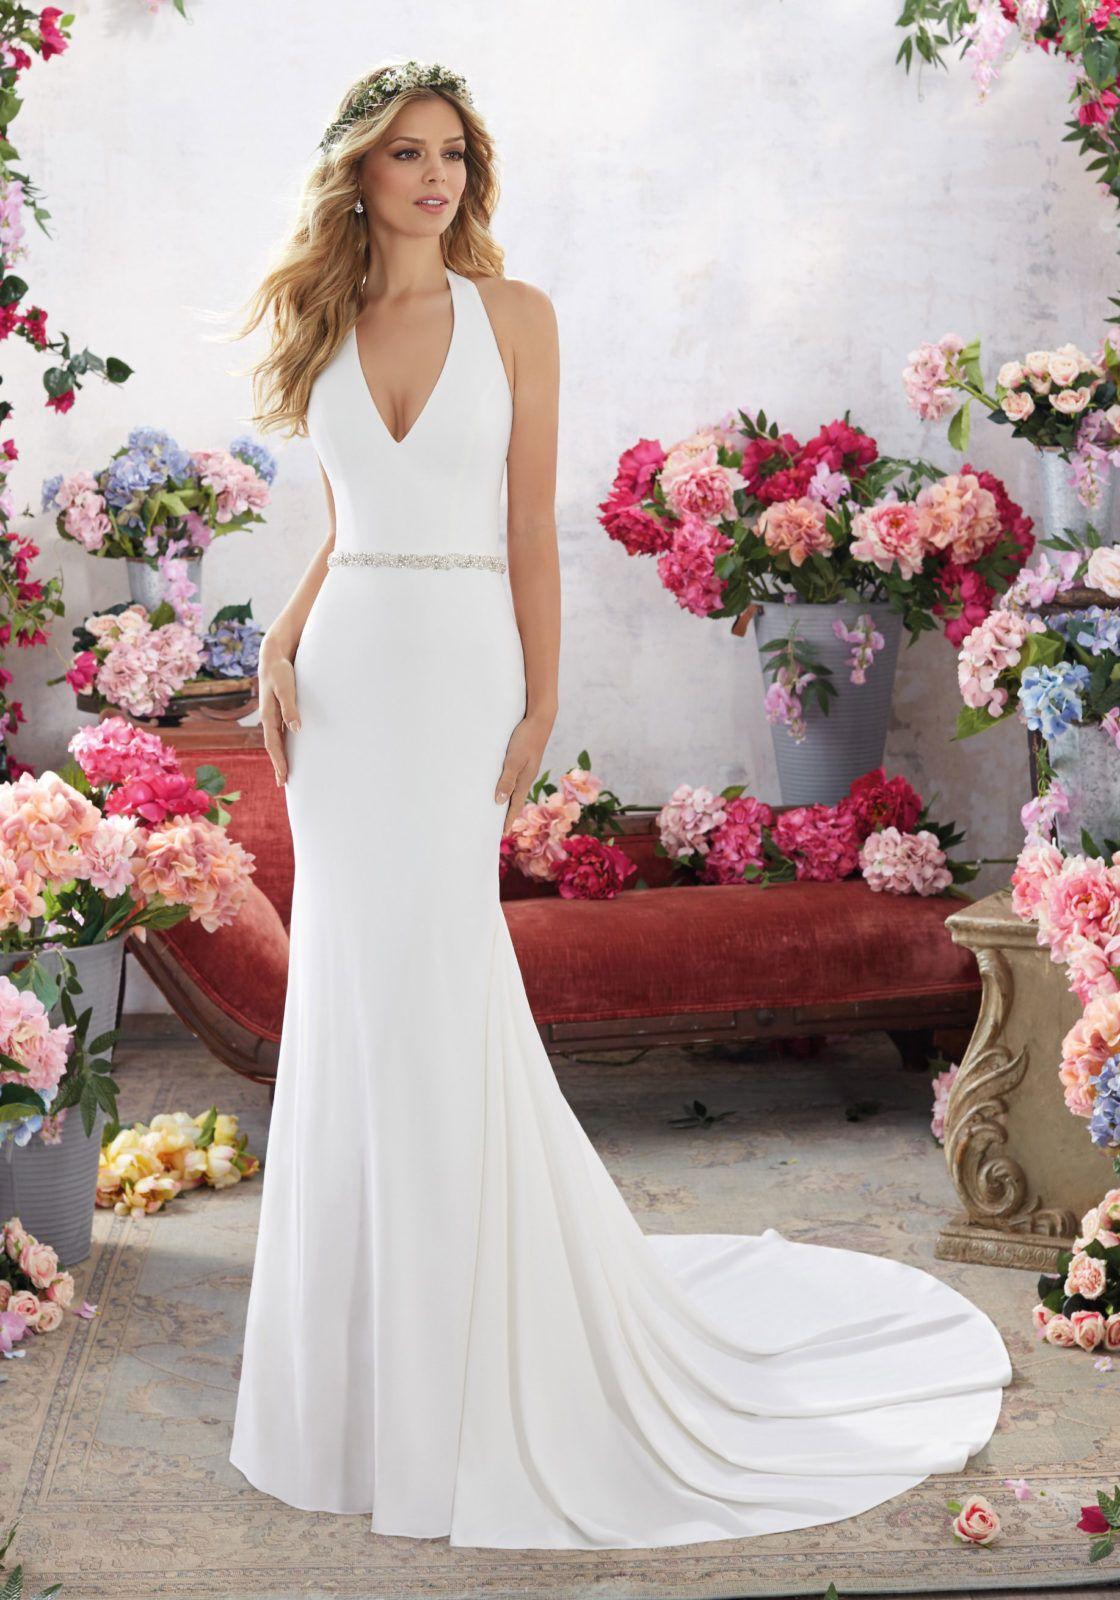 Mori lee wedding dresses pinterest neckline ivory and